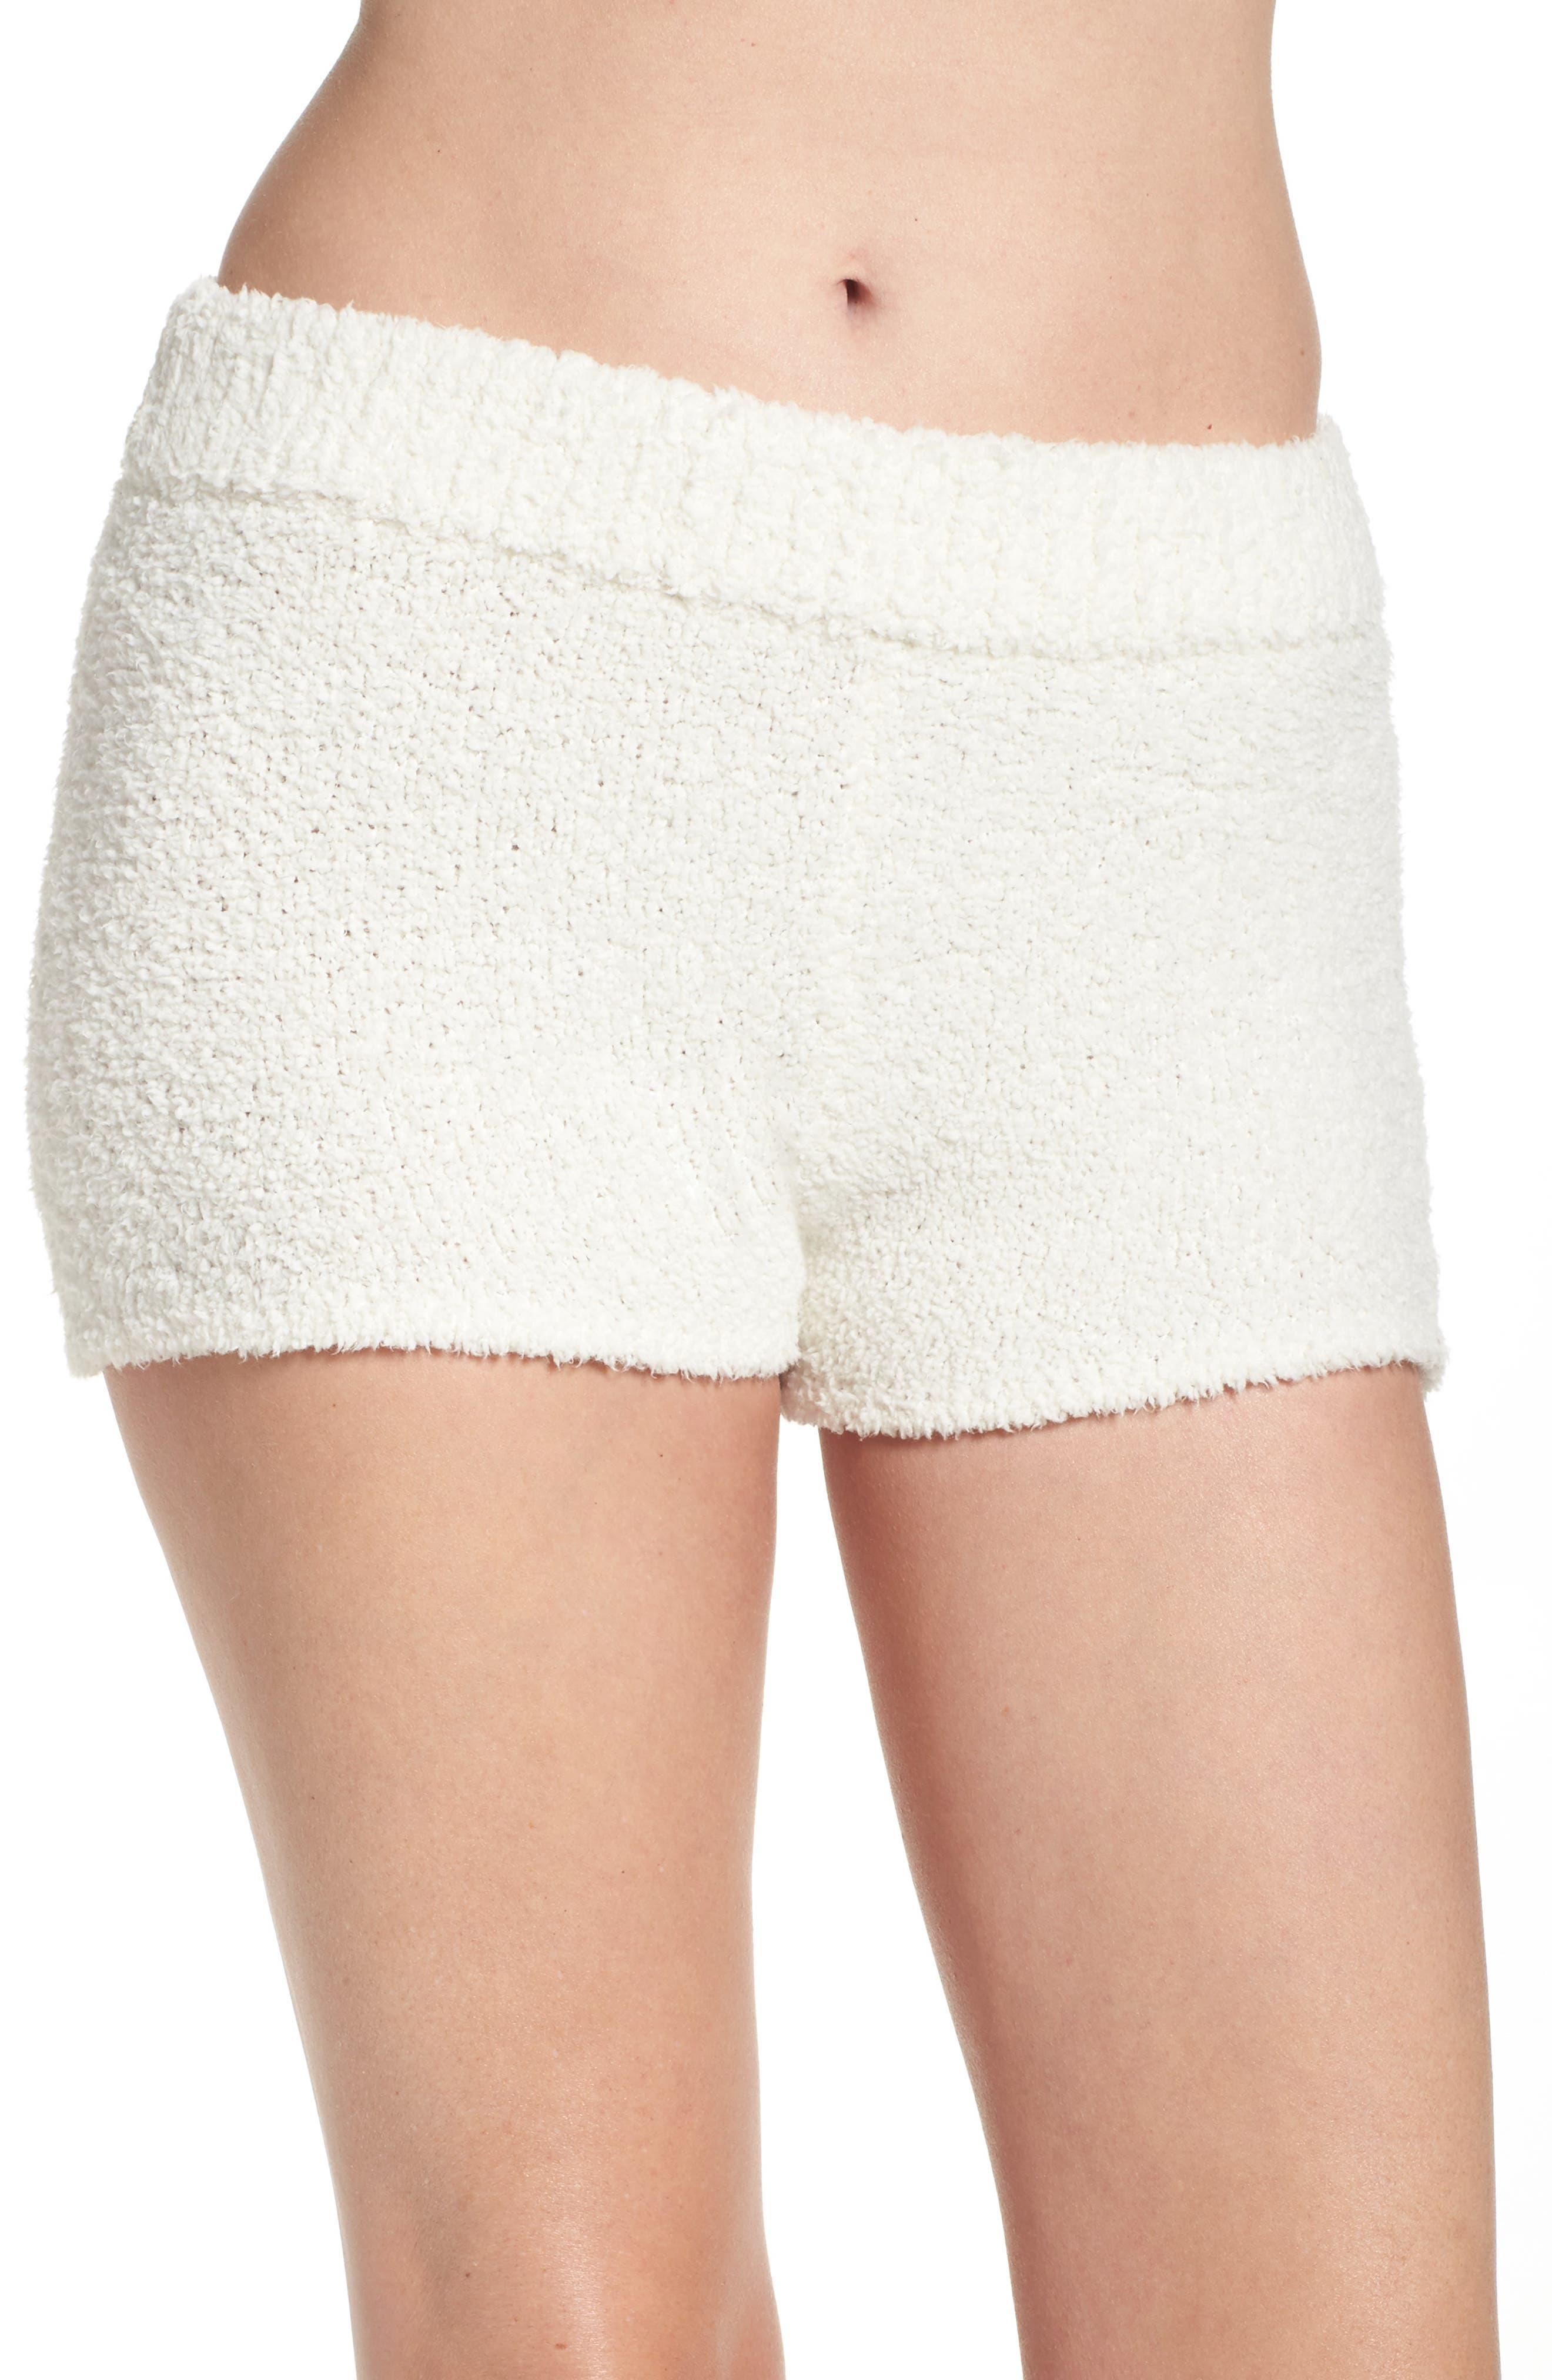 Sweater Knit Pajama Shorts,                         Main,                         color, 900